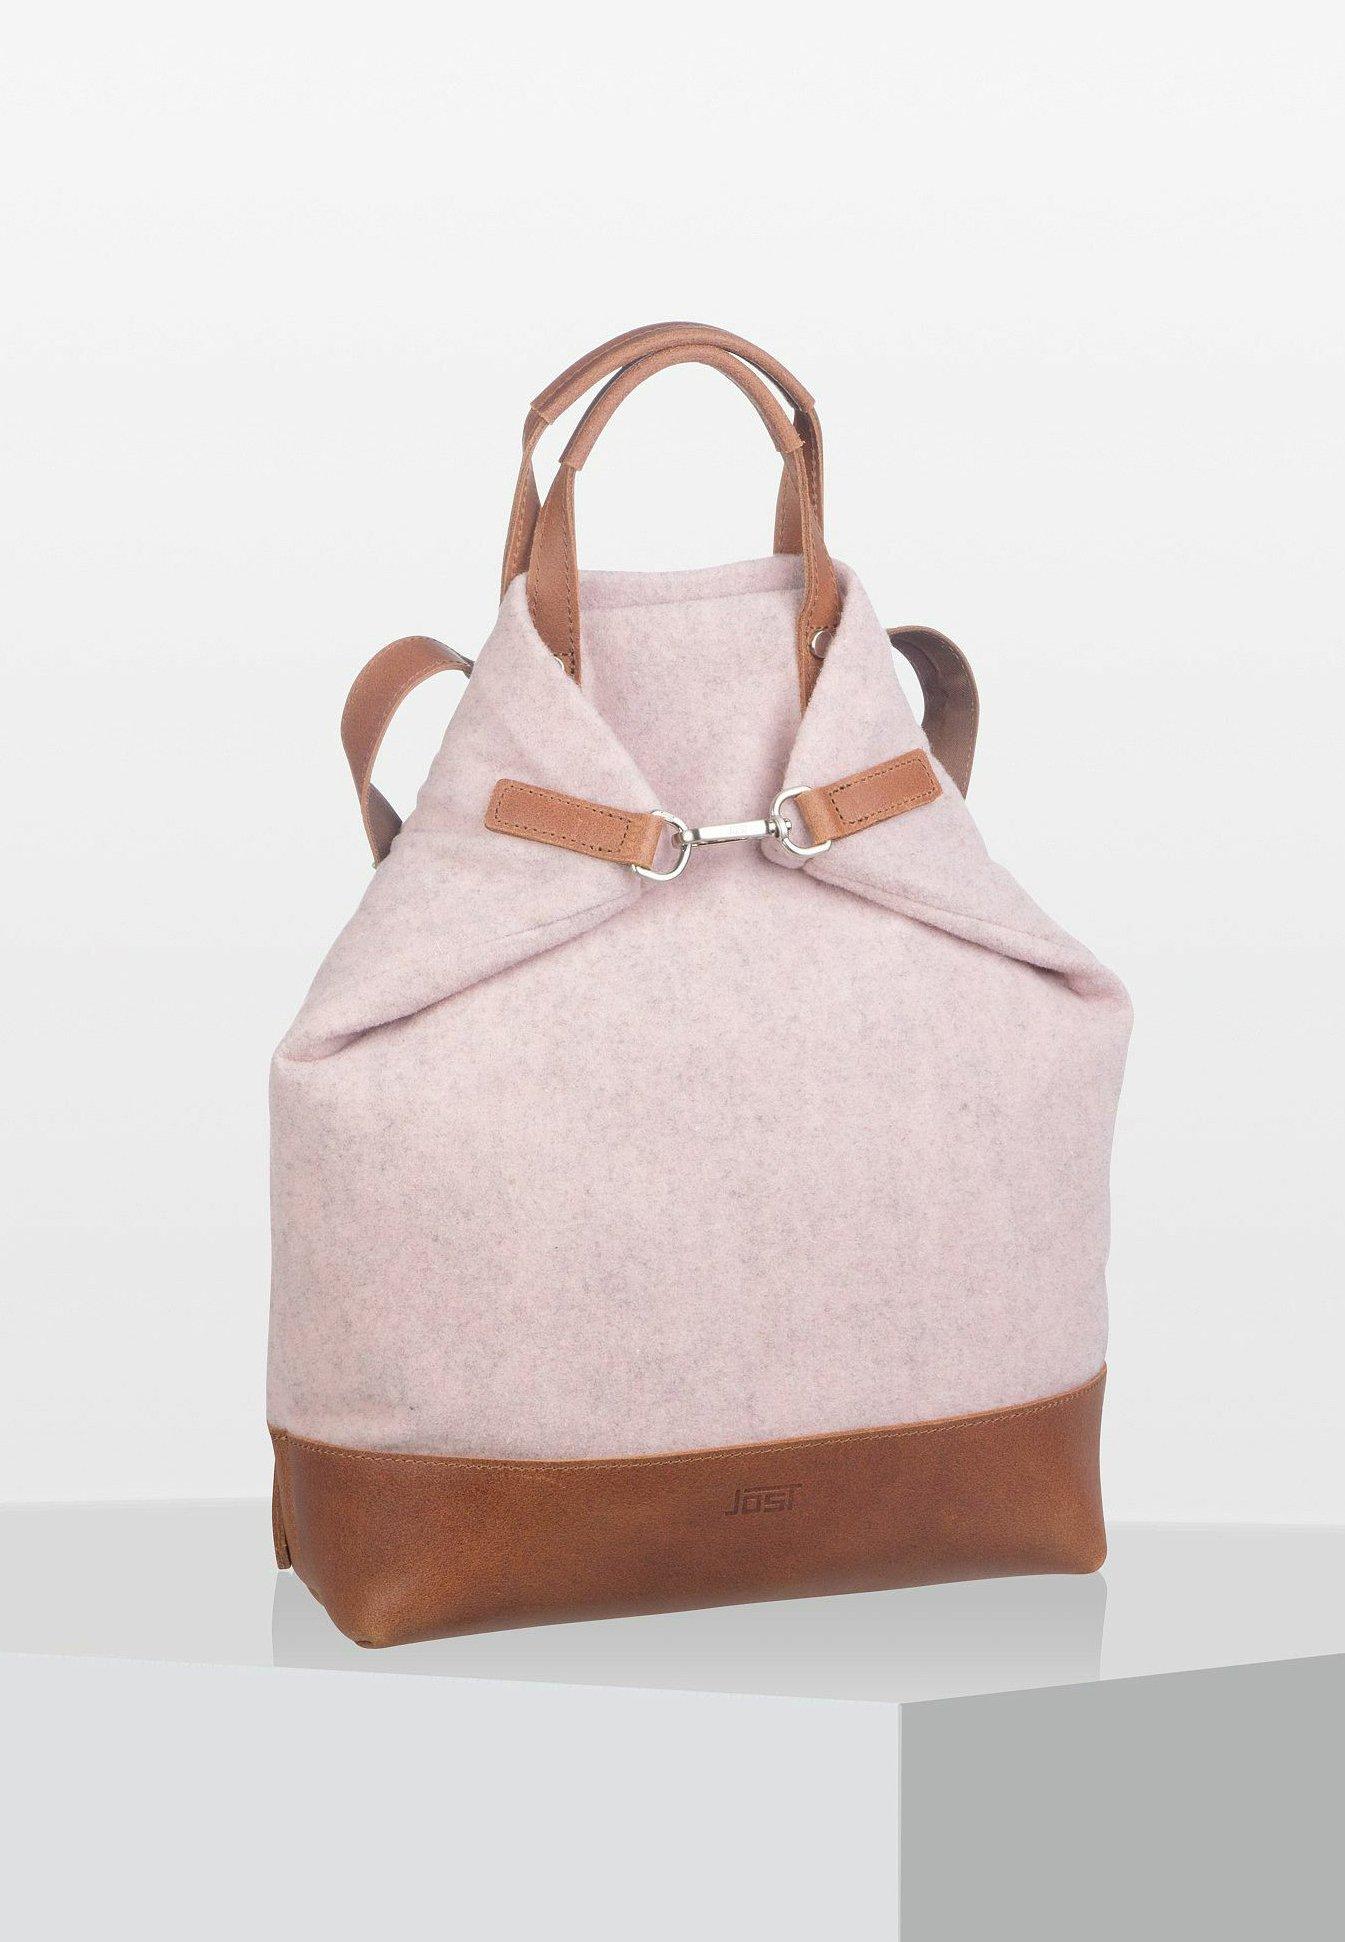 Rabatt Jost FARUM - Tagesrucksack - light pink   Damenbekleidung 2020